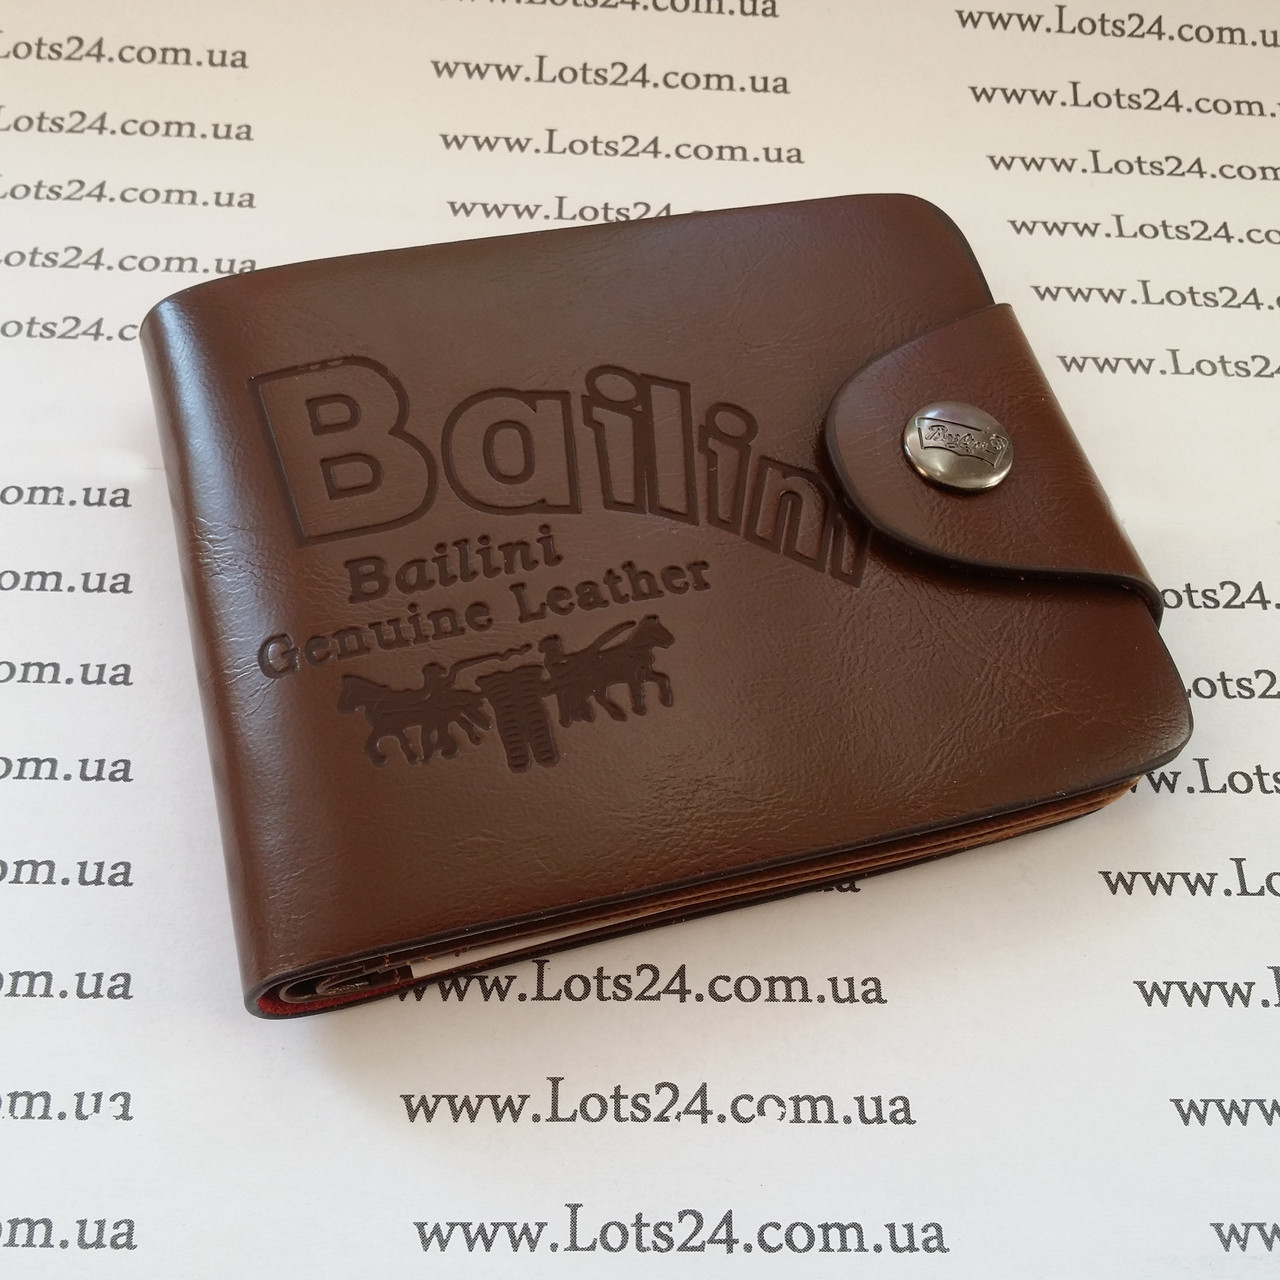 e50d74226847 Мужской кожаный кошелек BAILINI + нож кредитка - Интернет-магазин  Lots24.com.ua